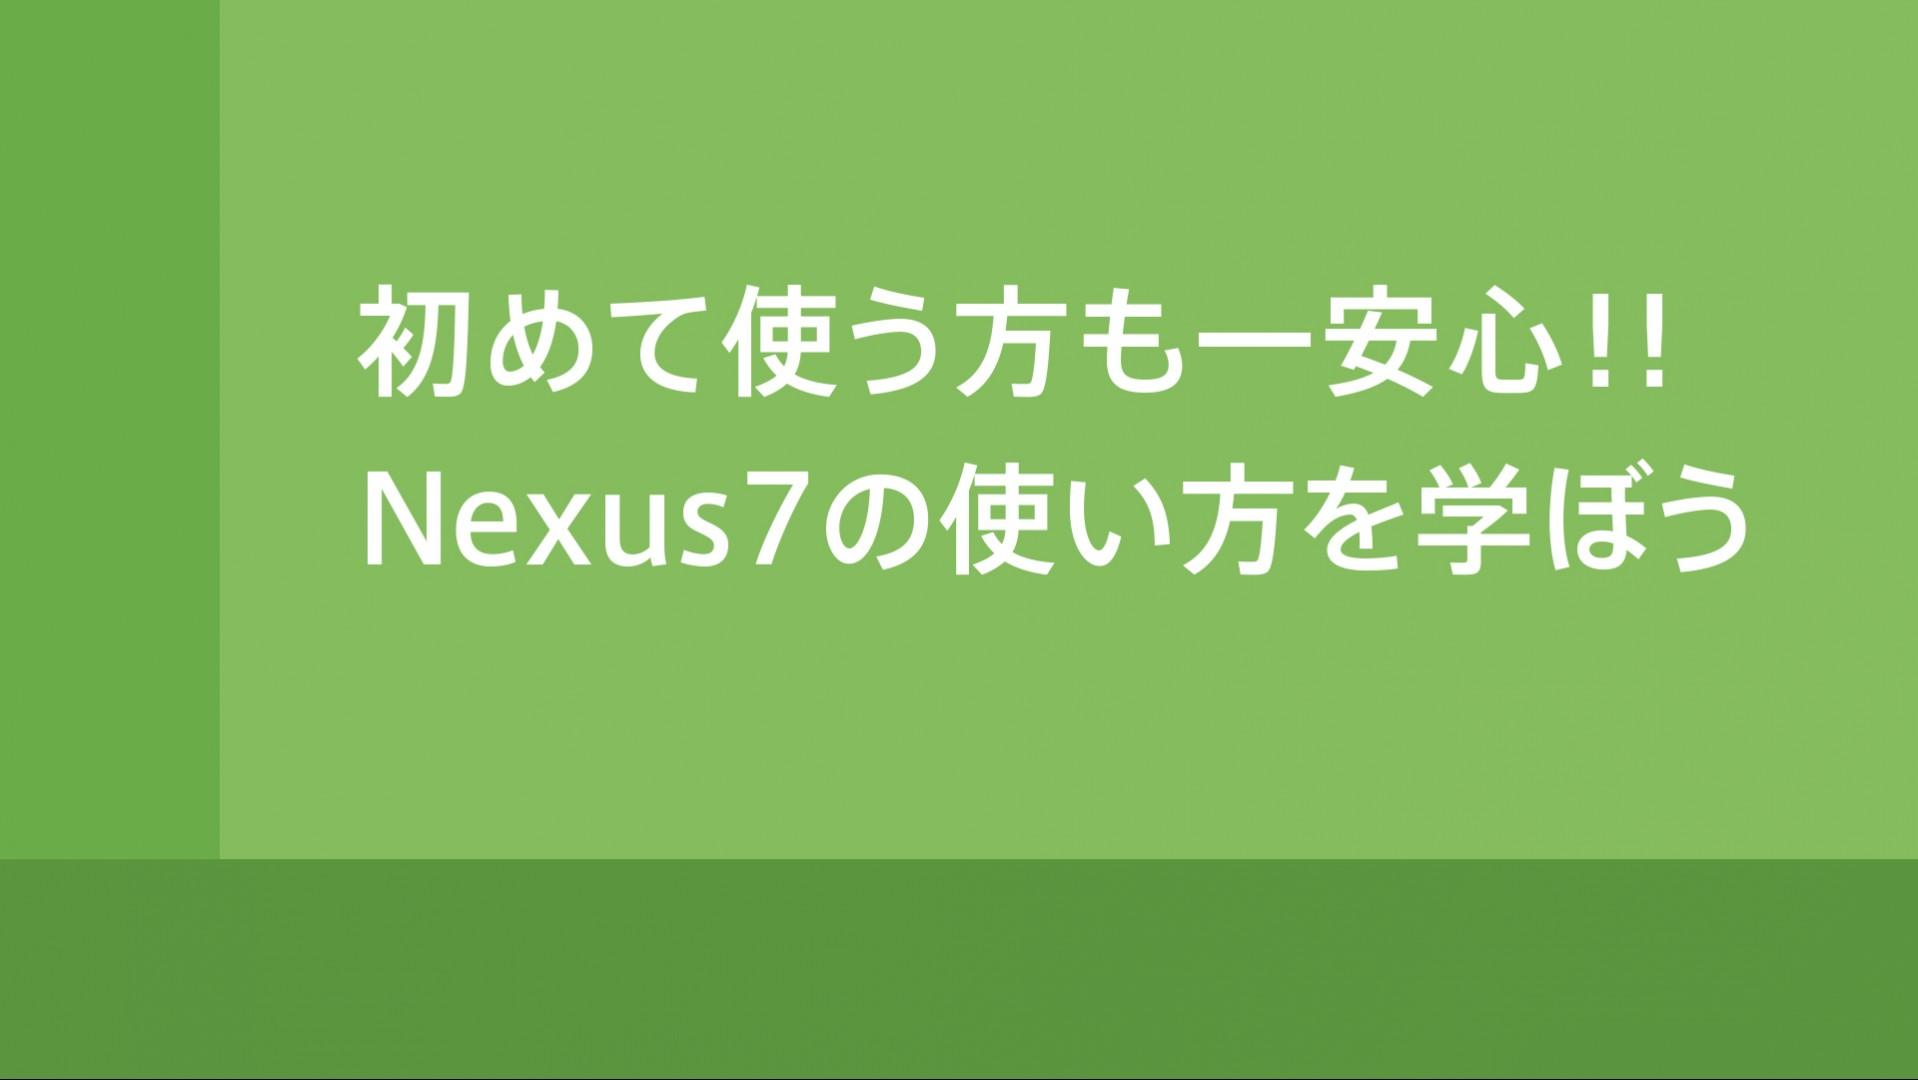 Nexus7 使い方 画面の明るさ、スリープ時間の設定